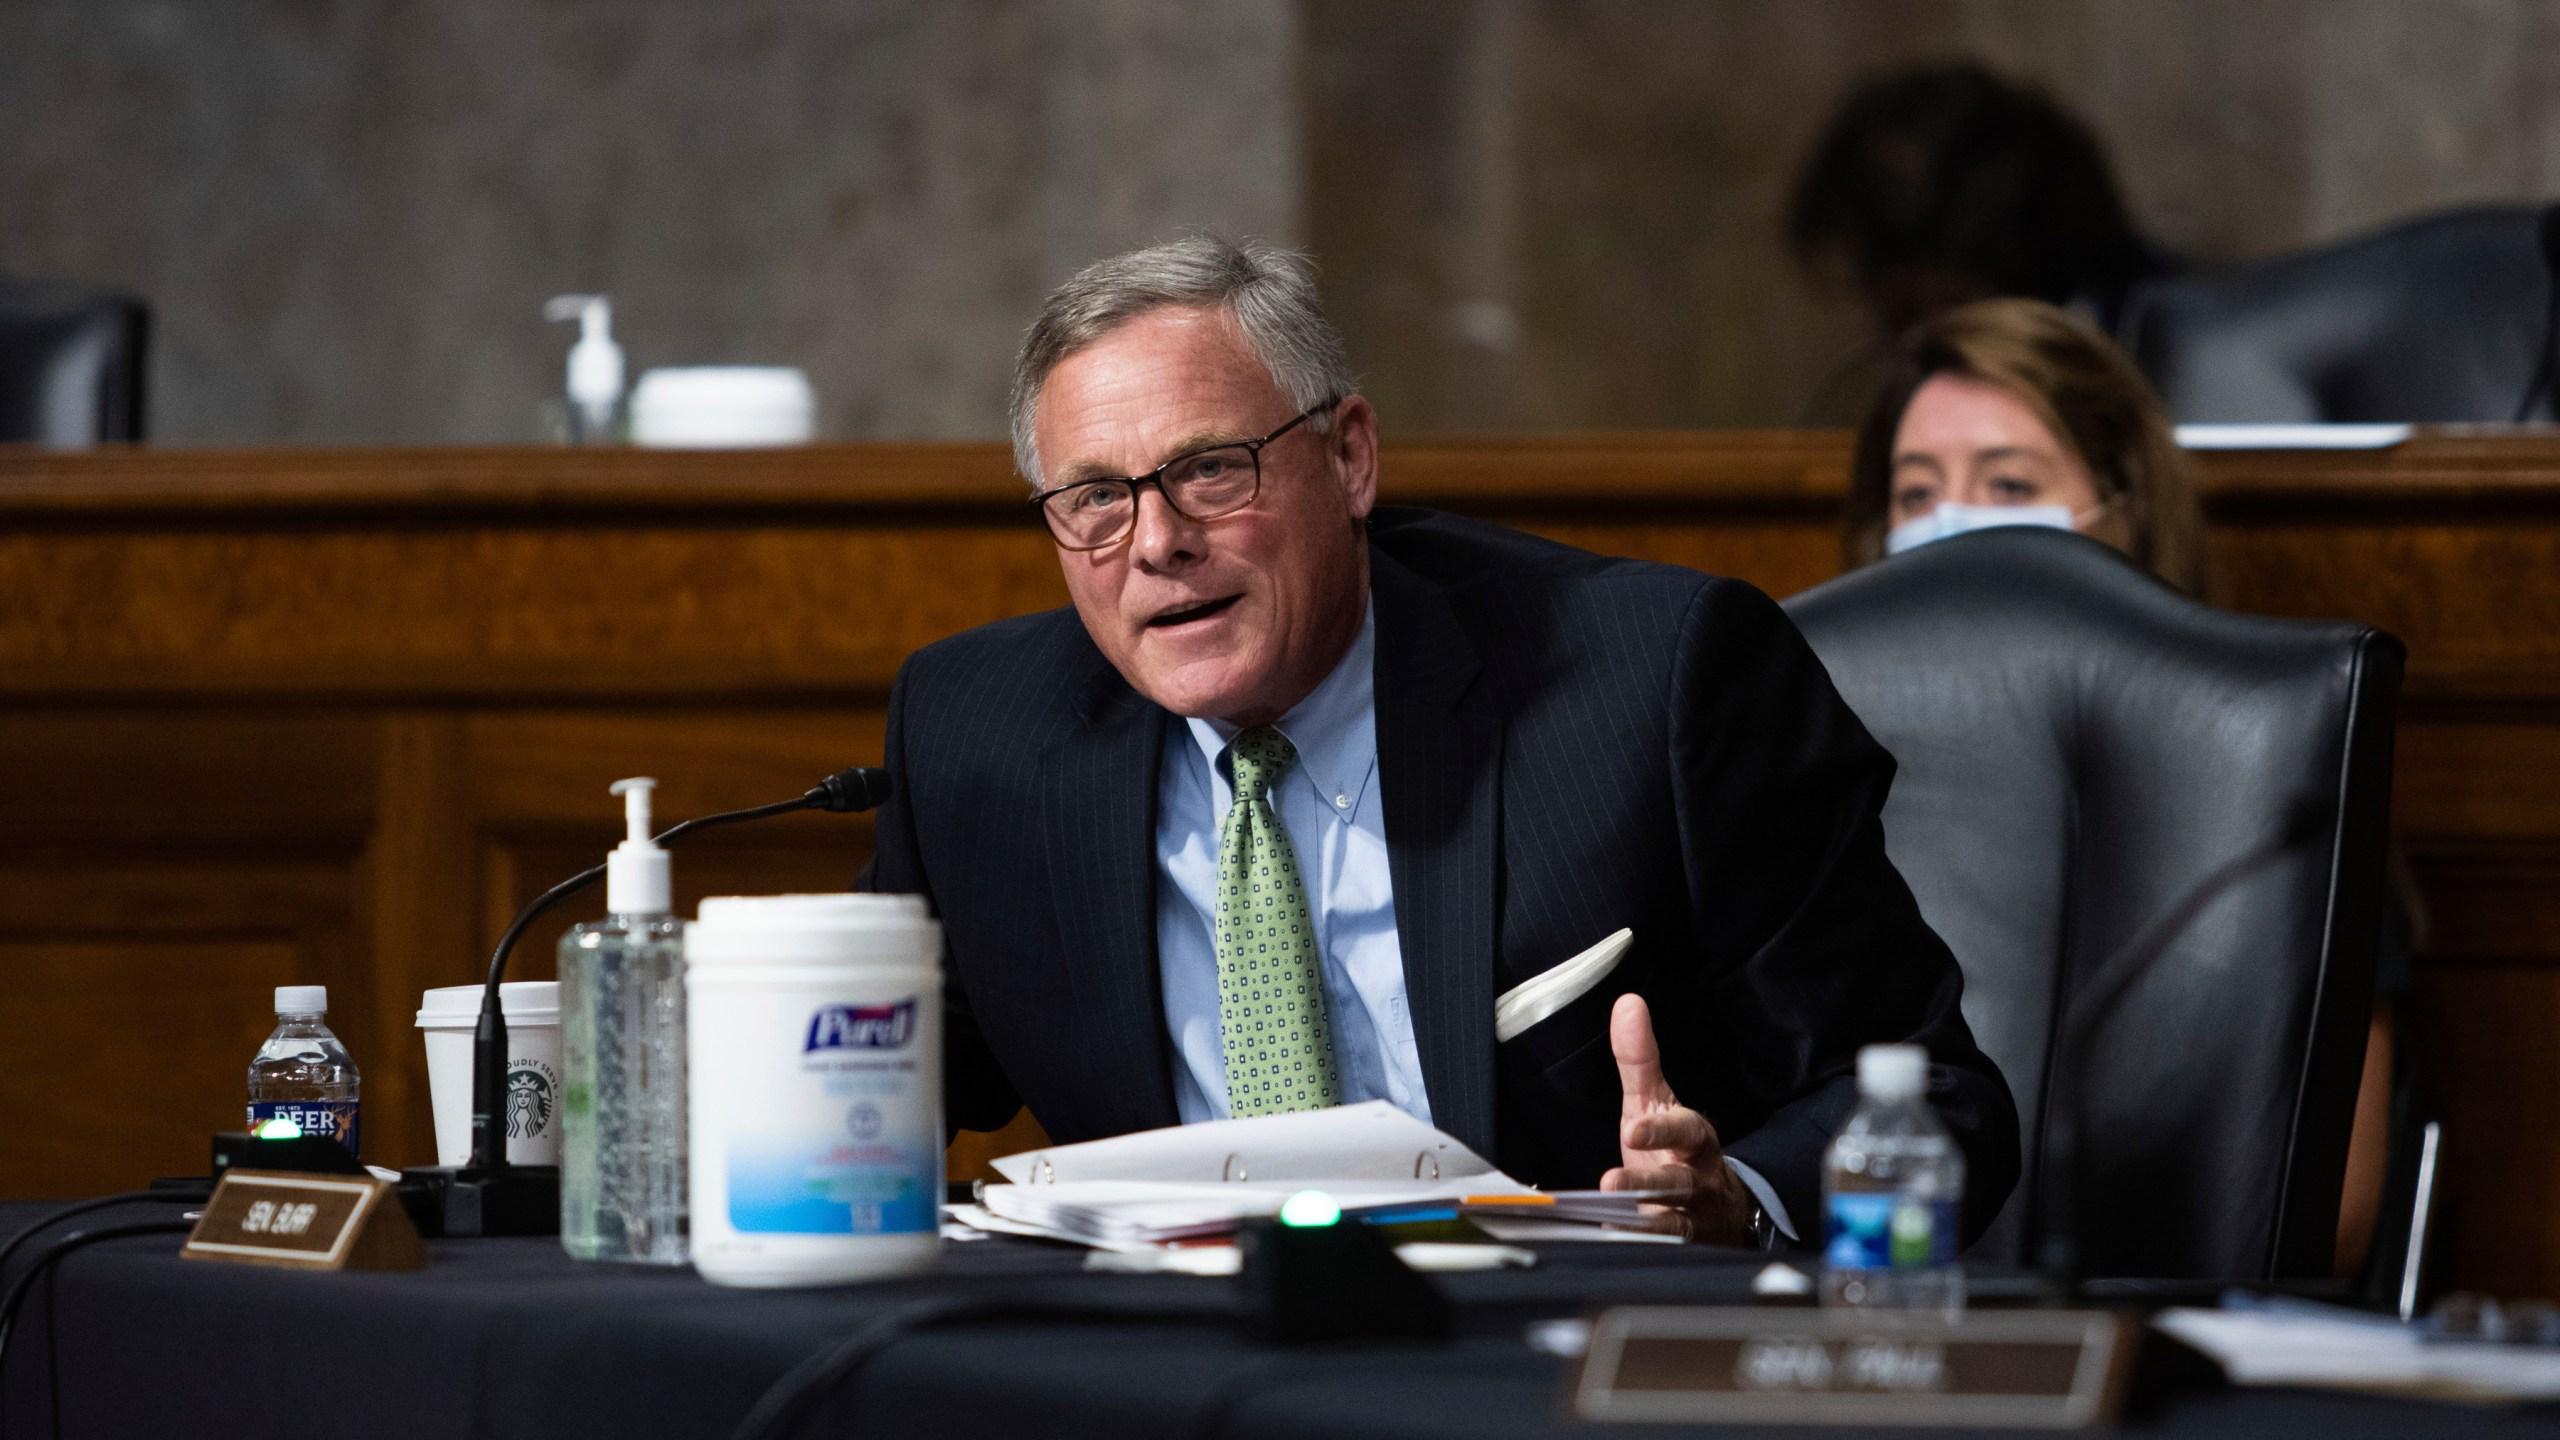 Senate Hearing to Examine Federal Response to COVID-19